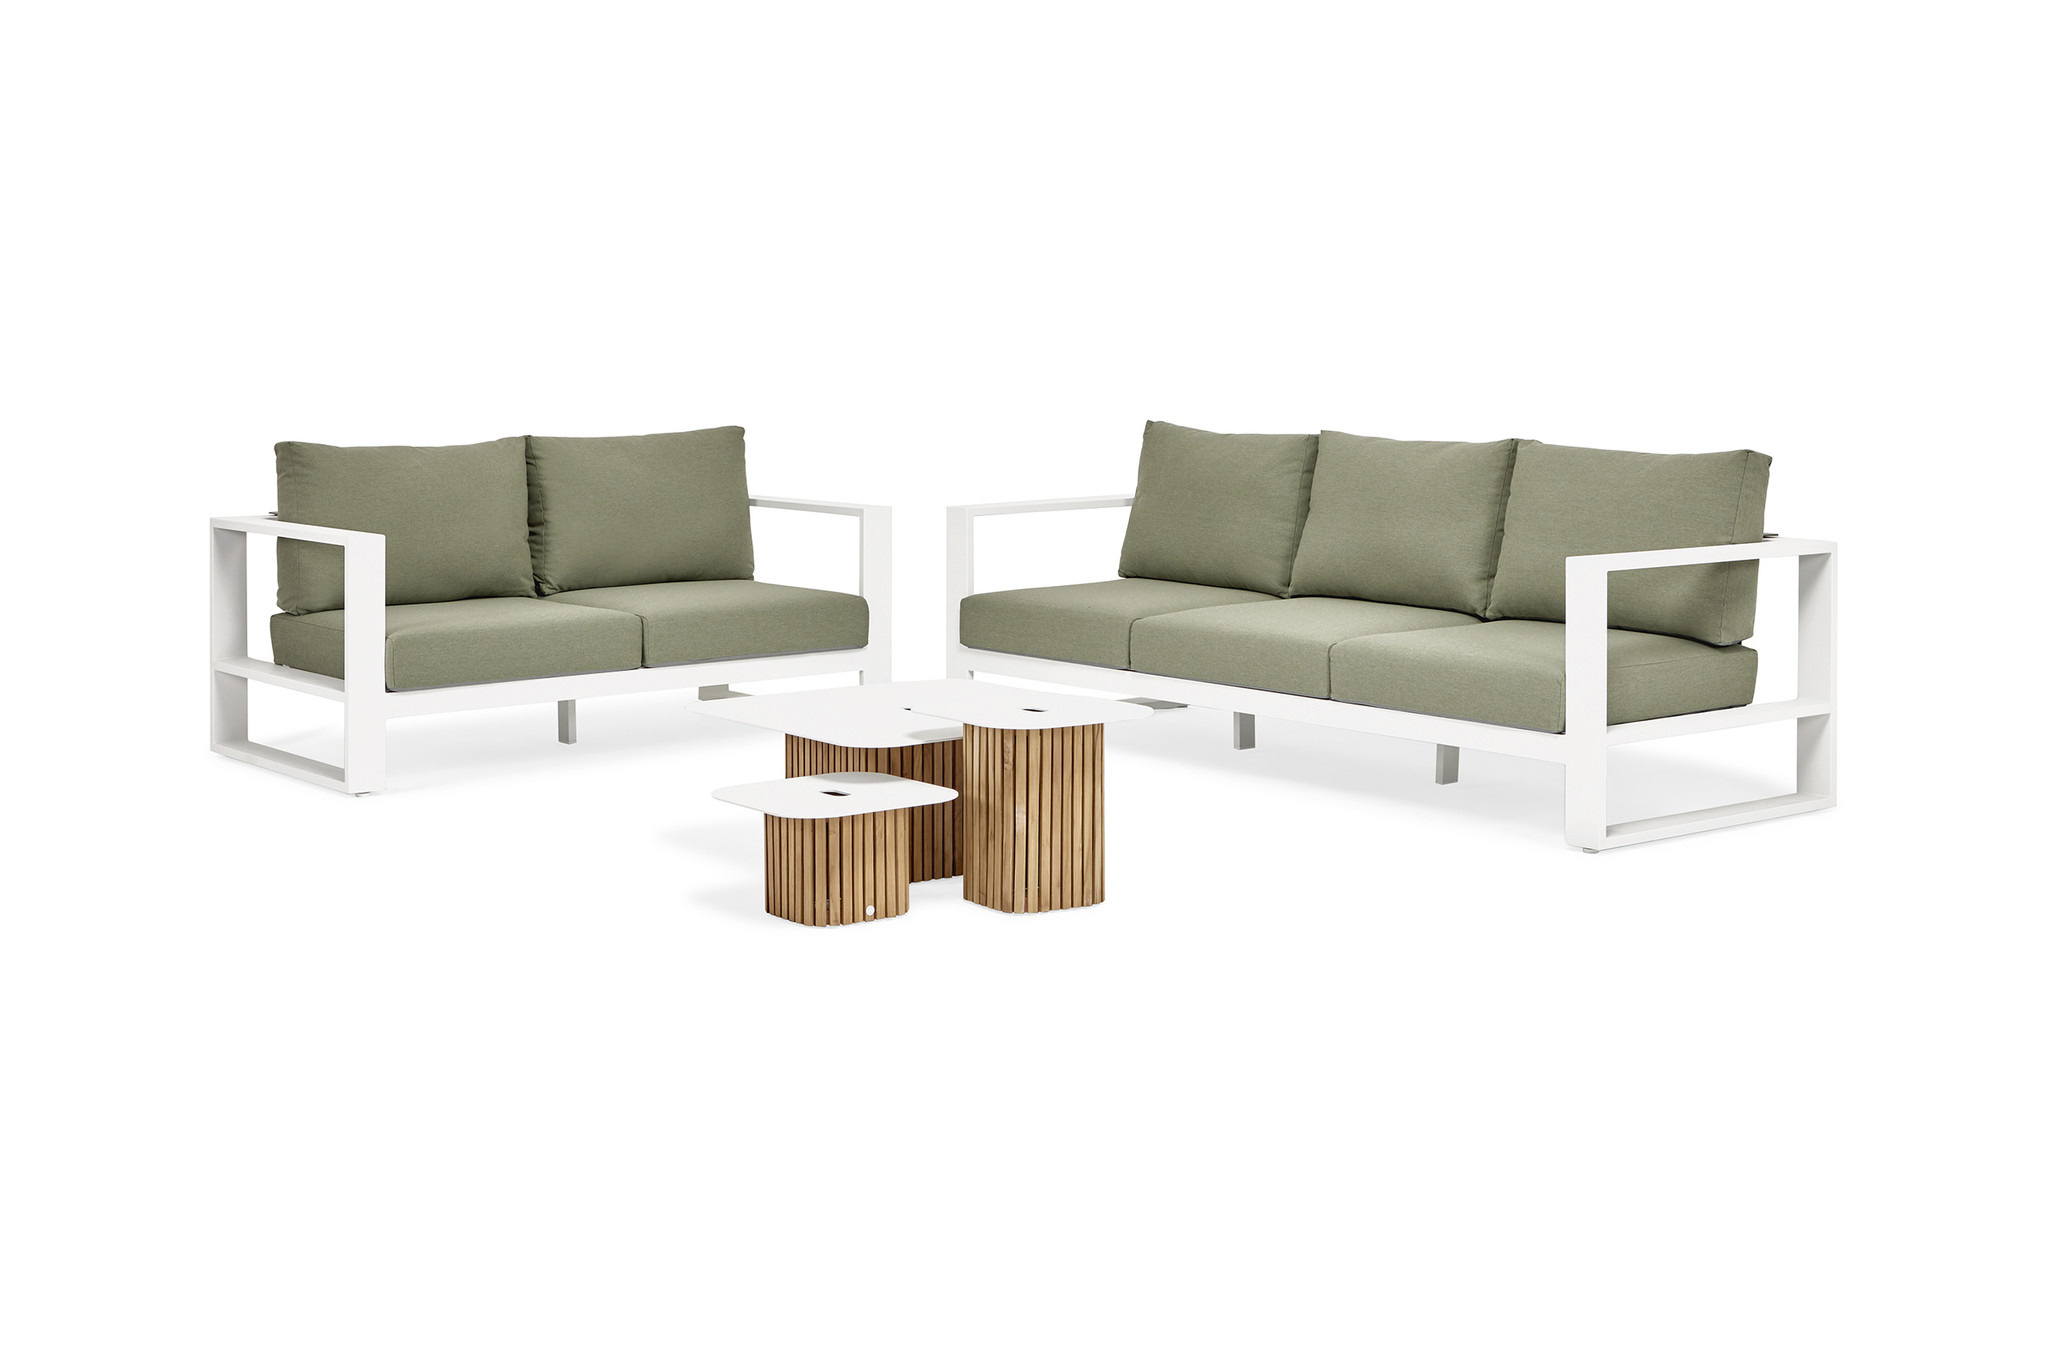 SUNS tuinmeubelen Savona Loungeset | 2- en 3 persoons loungebank incl. 2 salontafels